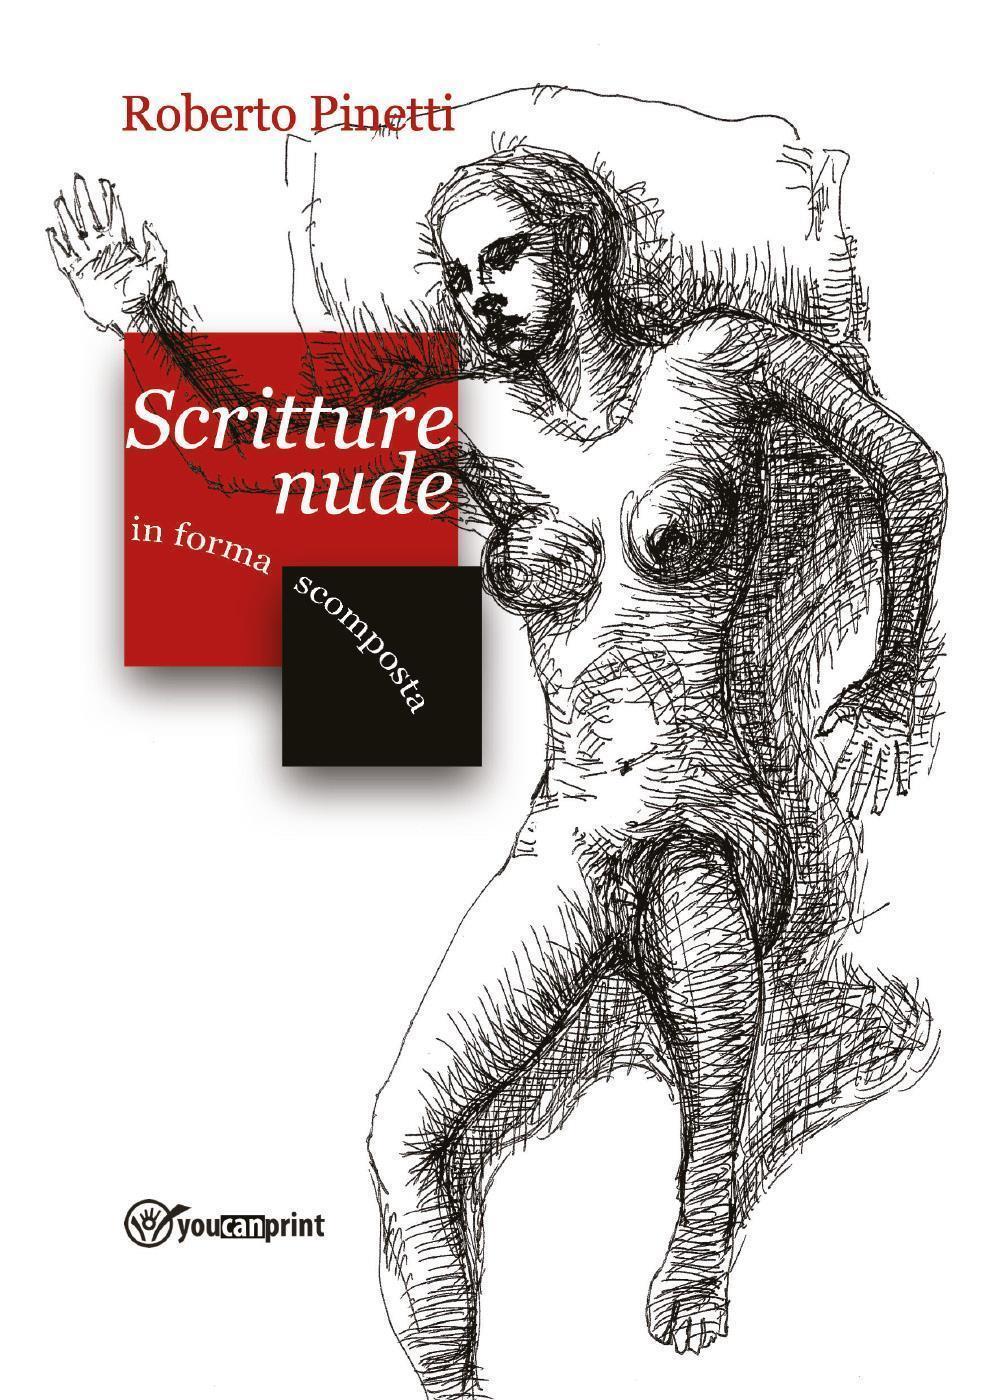 Scritture nude in forma scomposta